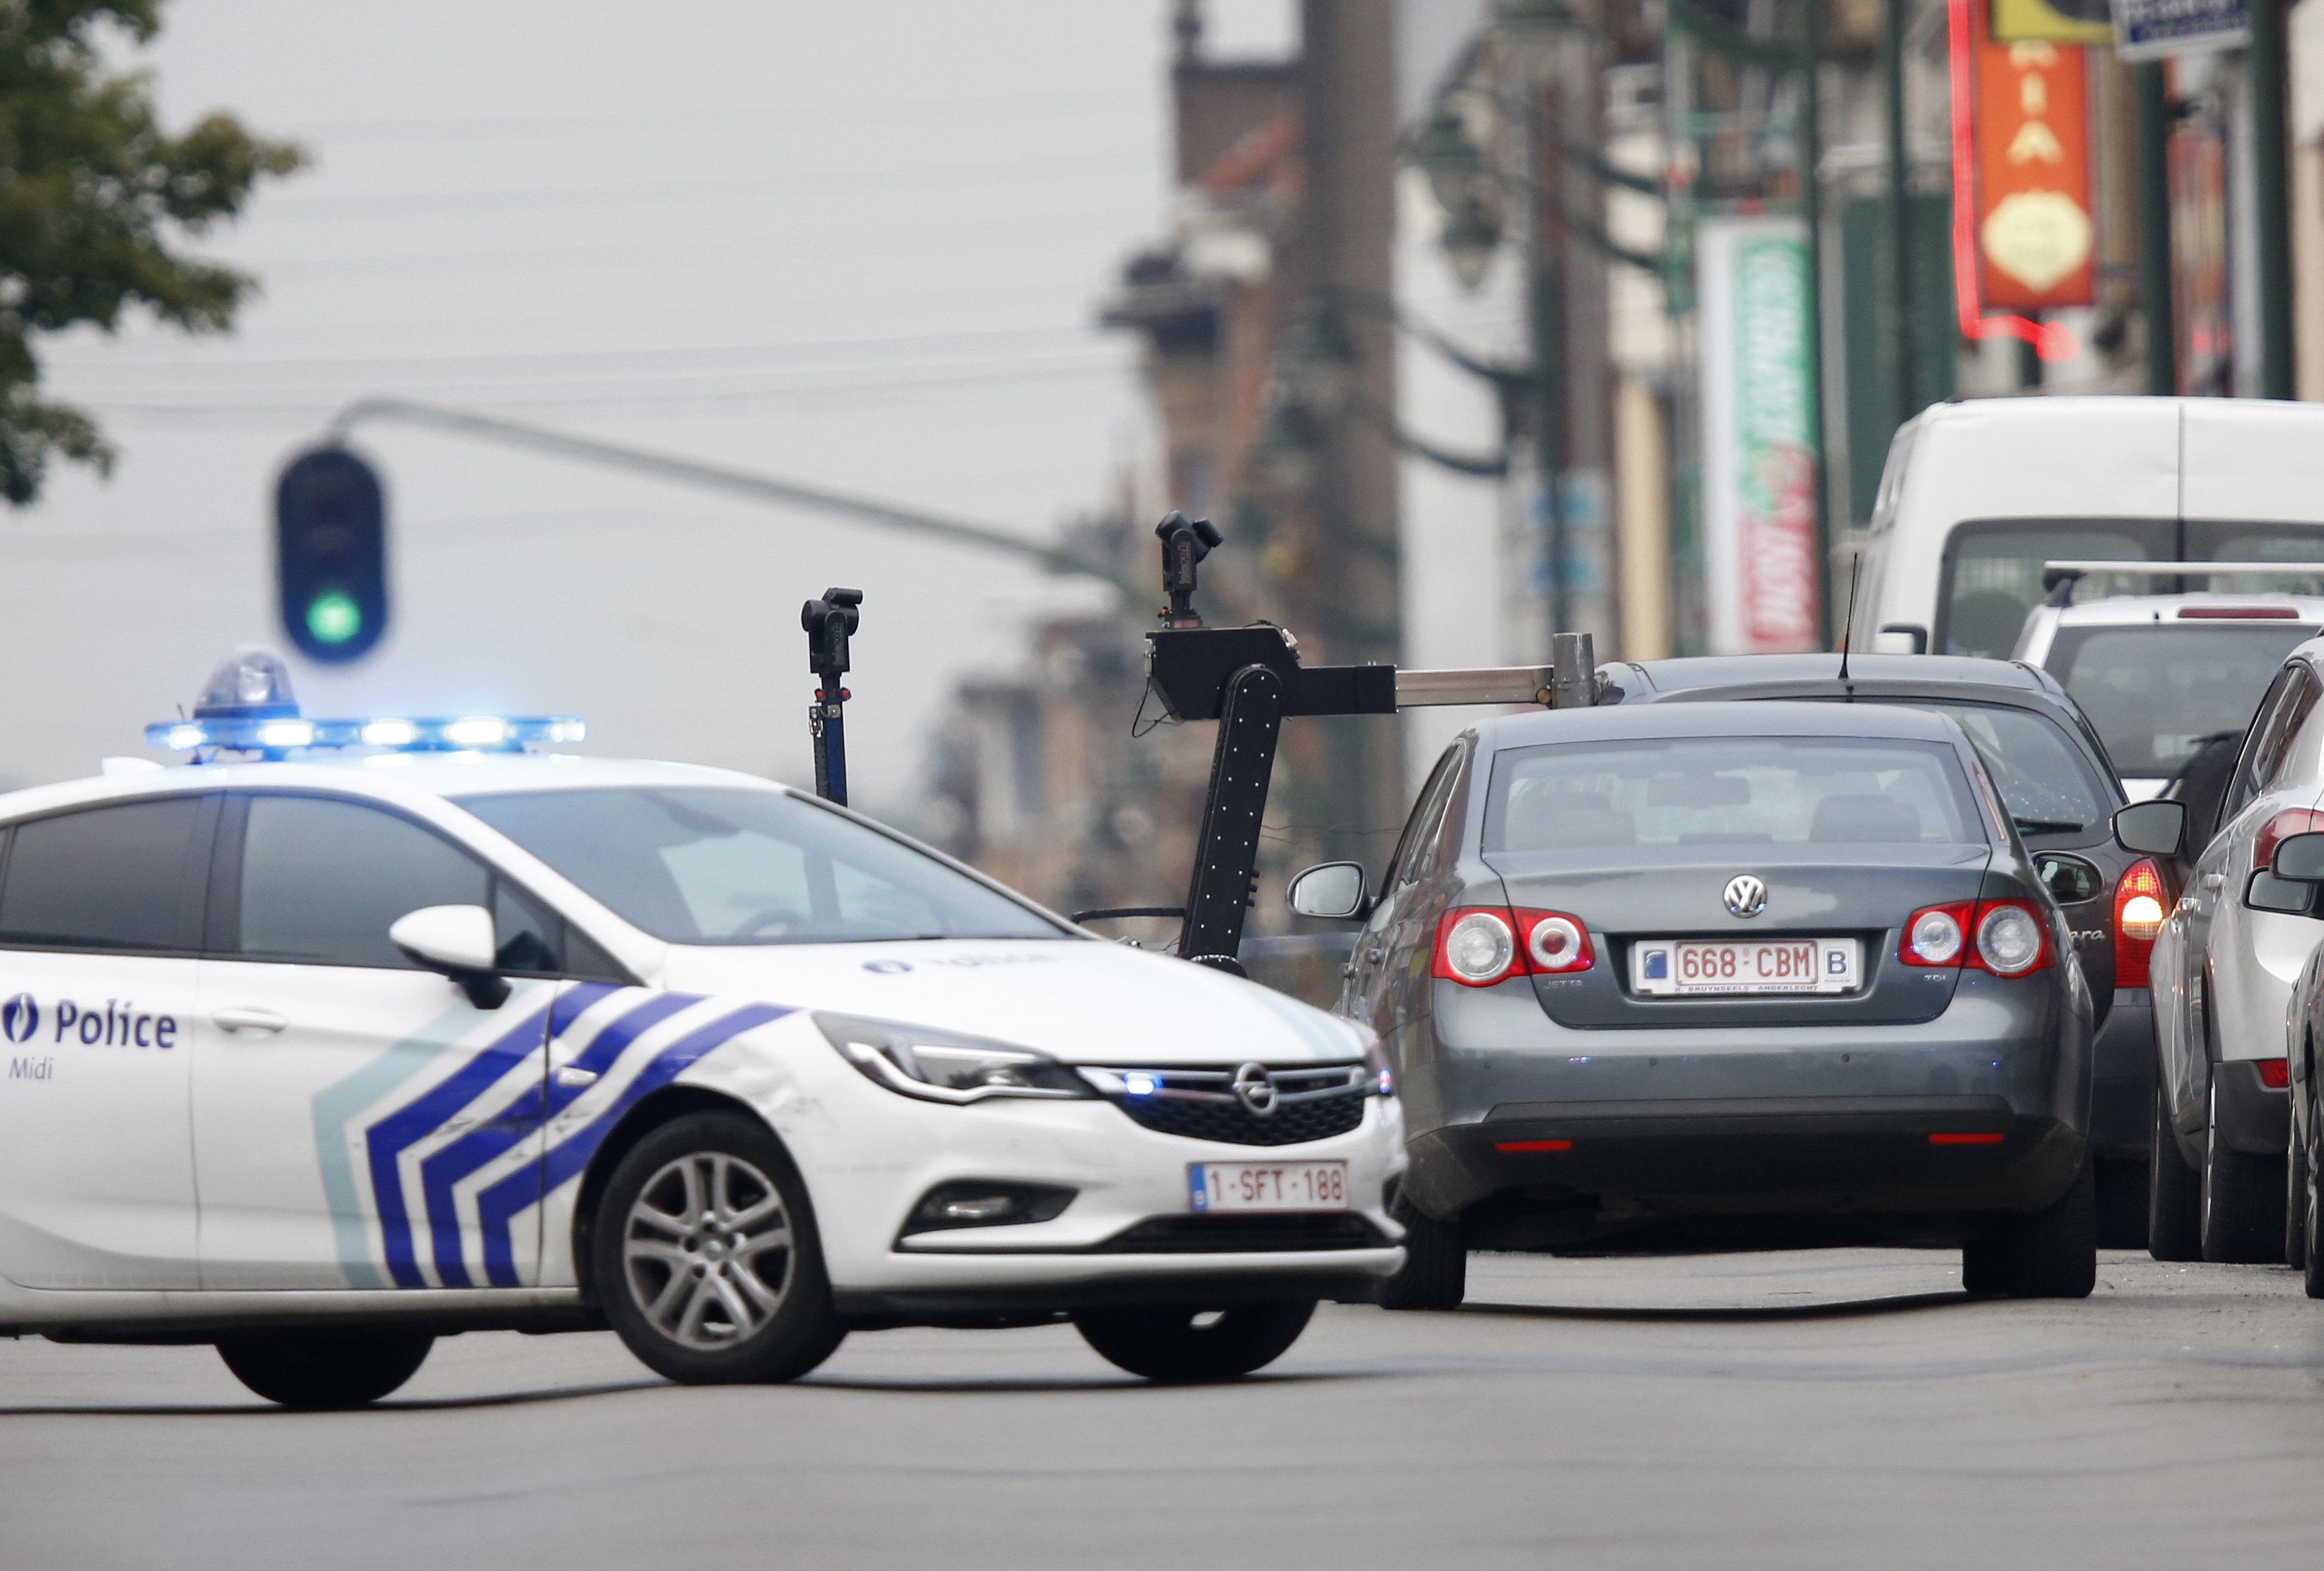 Aστυνομικοί πυροβόλησαν άνδρα με μαχαίρι σε σιδηροδρομικό σταθμό